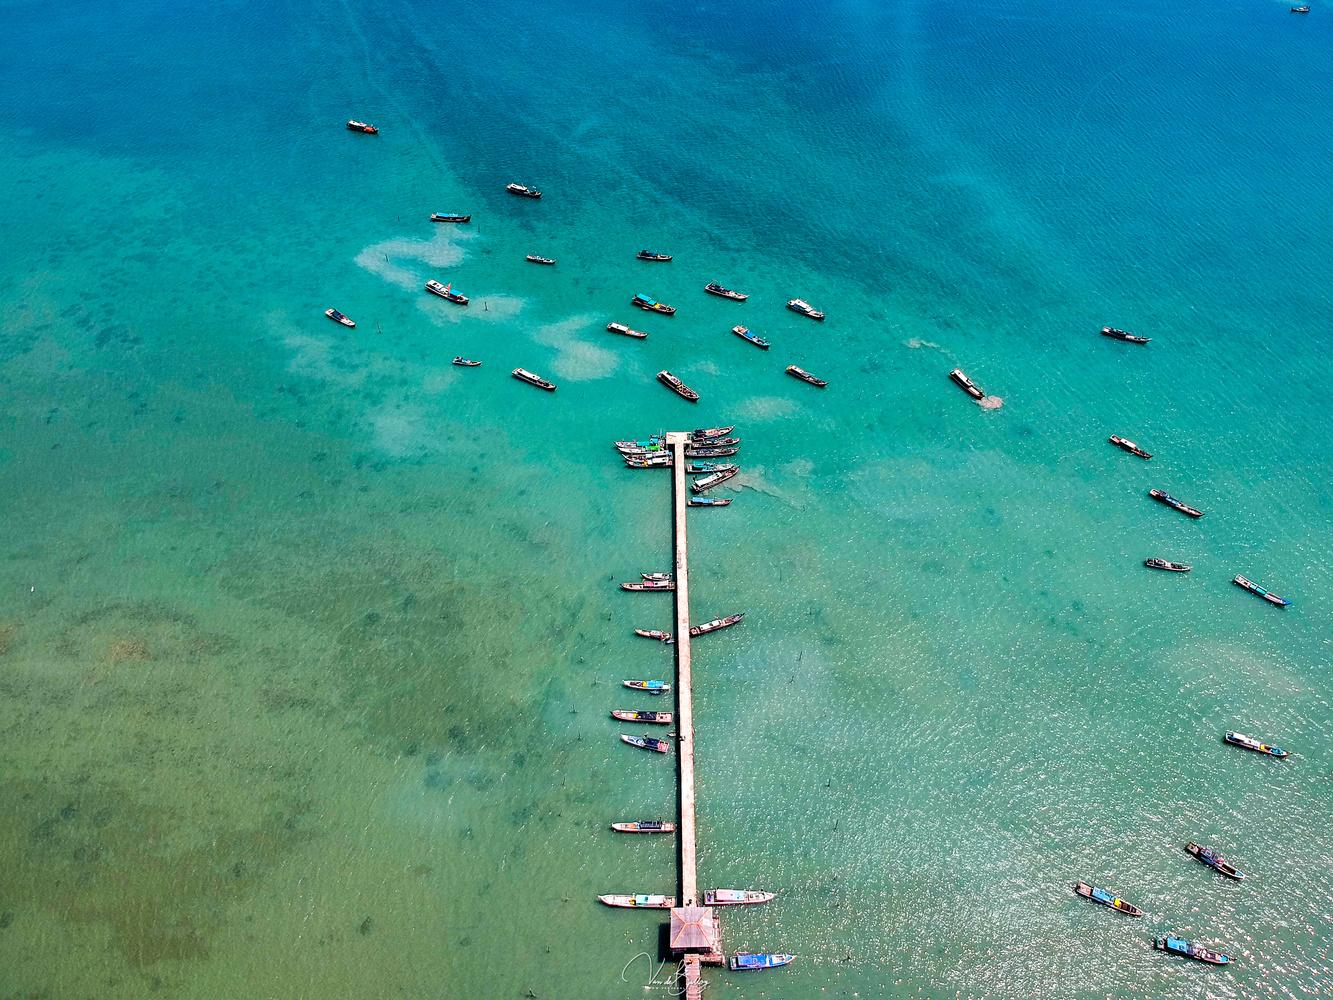 Pantai Tanjung kerasak by Dedy Irvandy